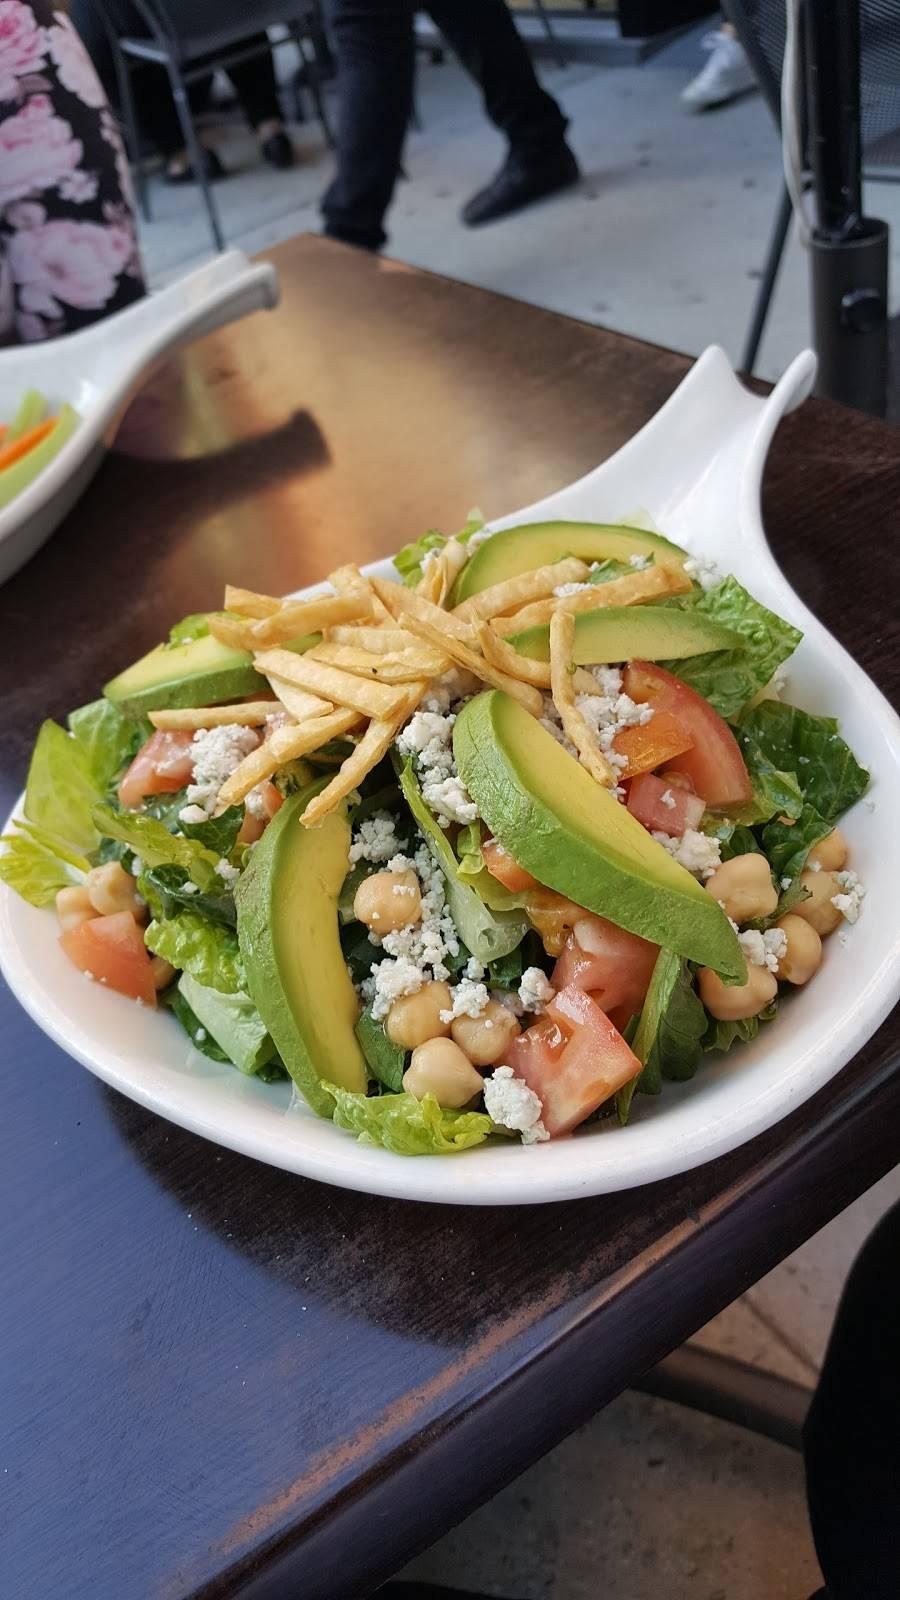 Mills Tavern | restaurant | 125 Washington St, Hoboken, NJ 07030, USA | 2017921900 OR +1 201-792-1900